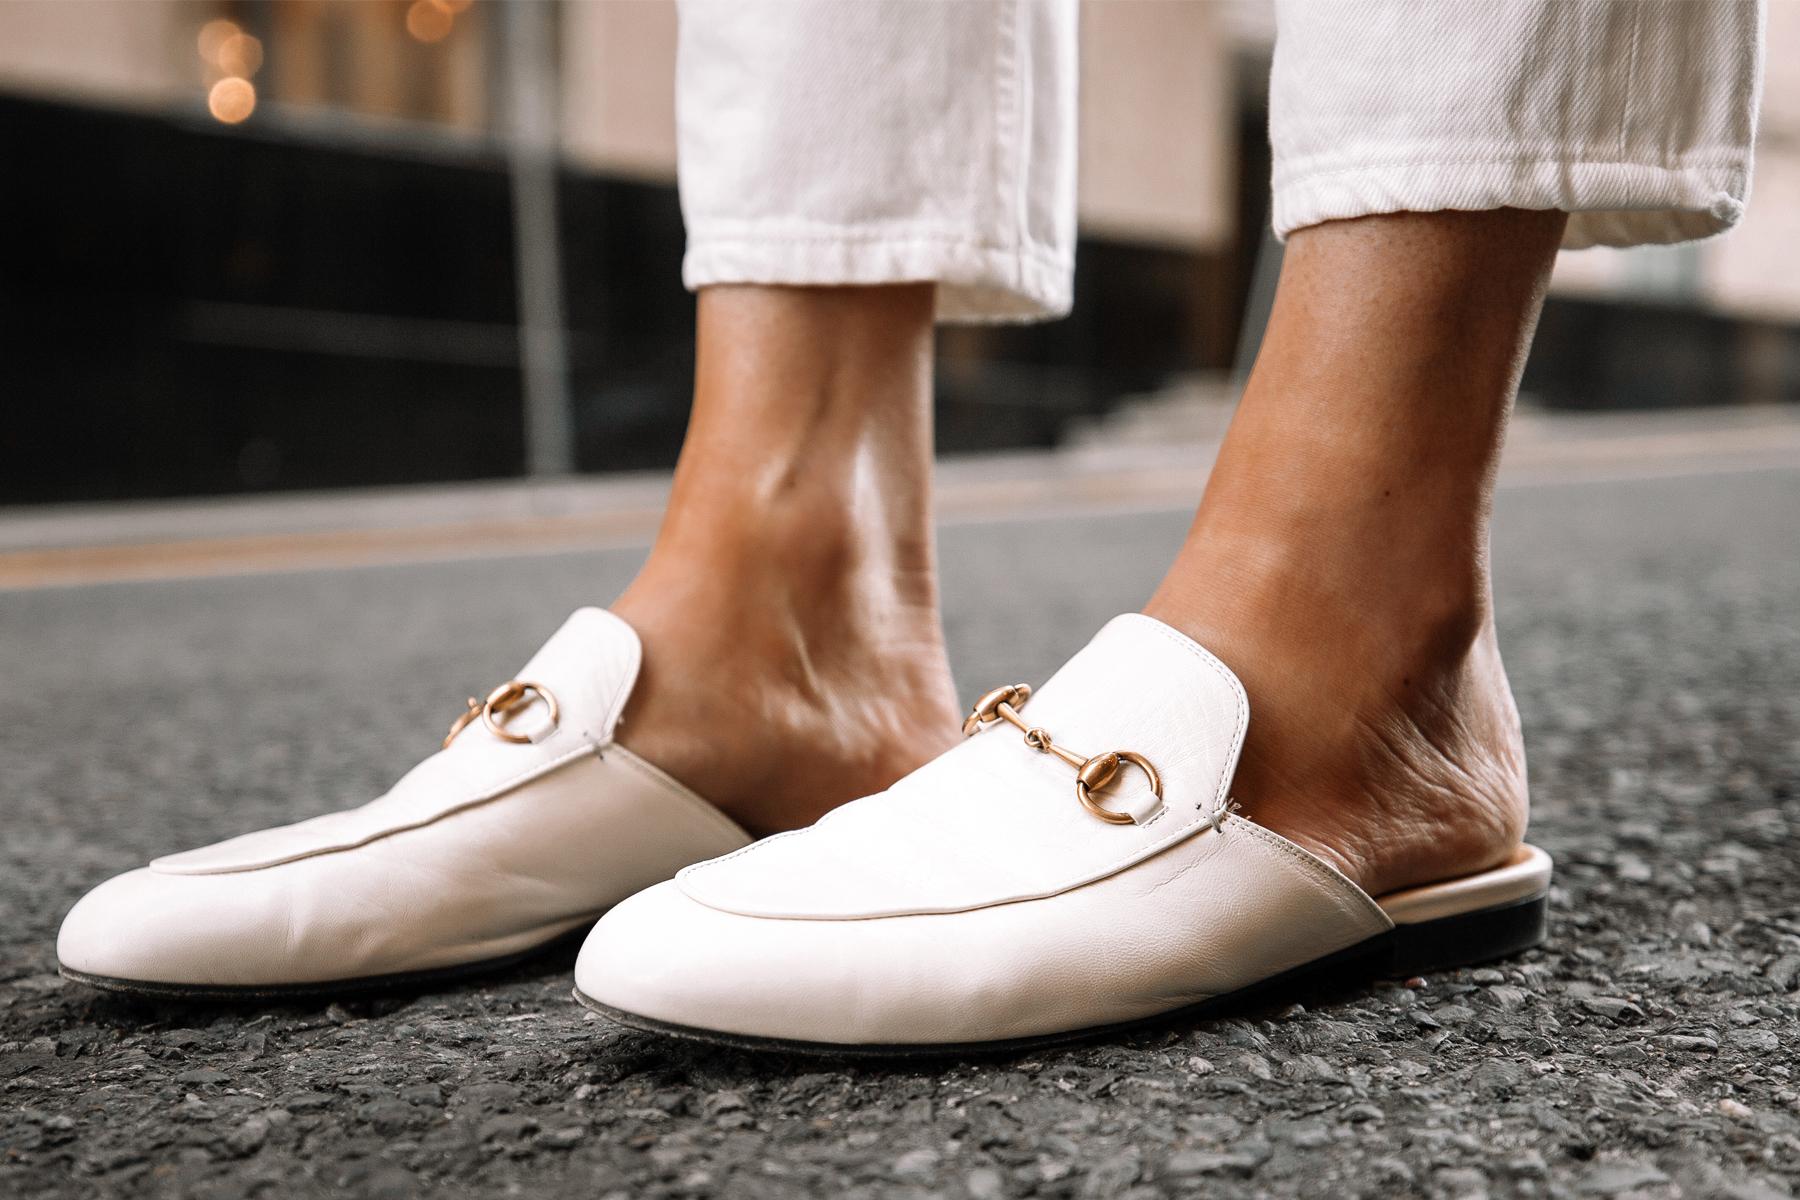 Fashion Jackson Wearing White Gucci Princetown Mules